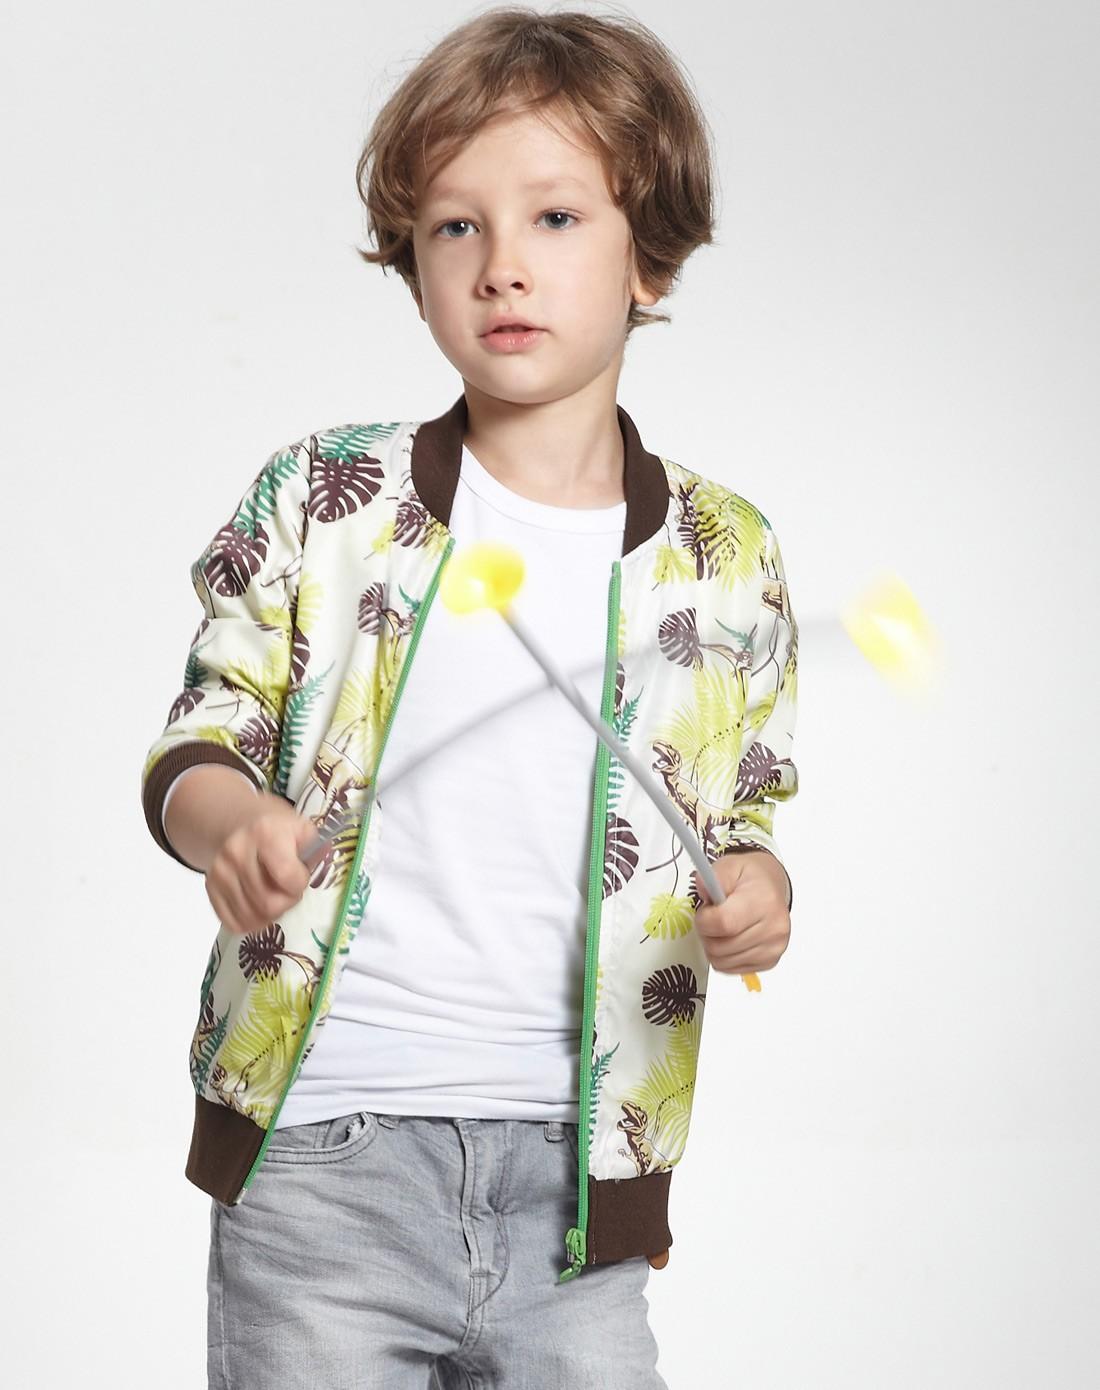 mini男童专场男童清新白外套jk0222b